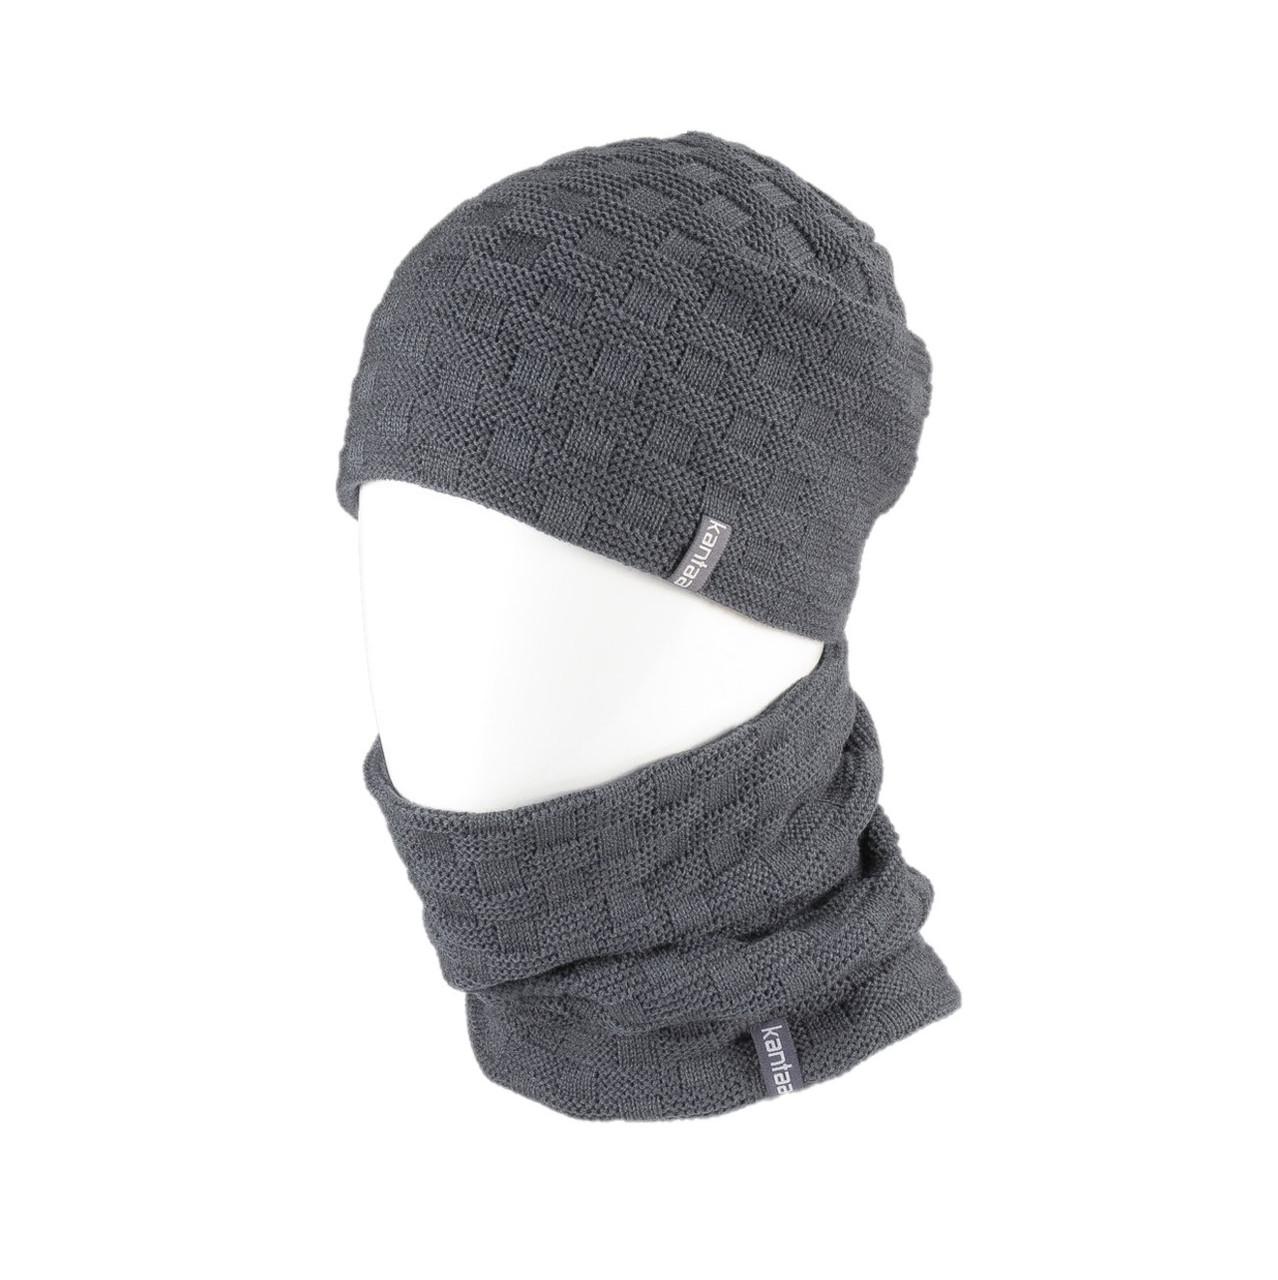 Вязаная шапка с Buff снуд КАНТА унисекс размер взрослый, серый (OC-048)